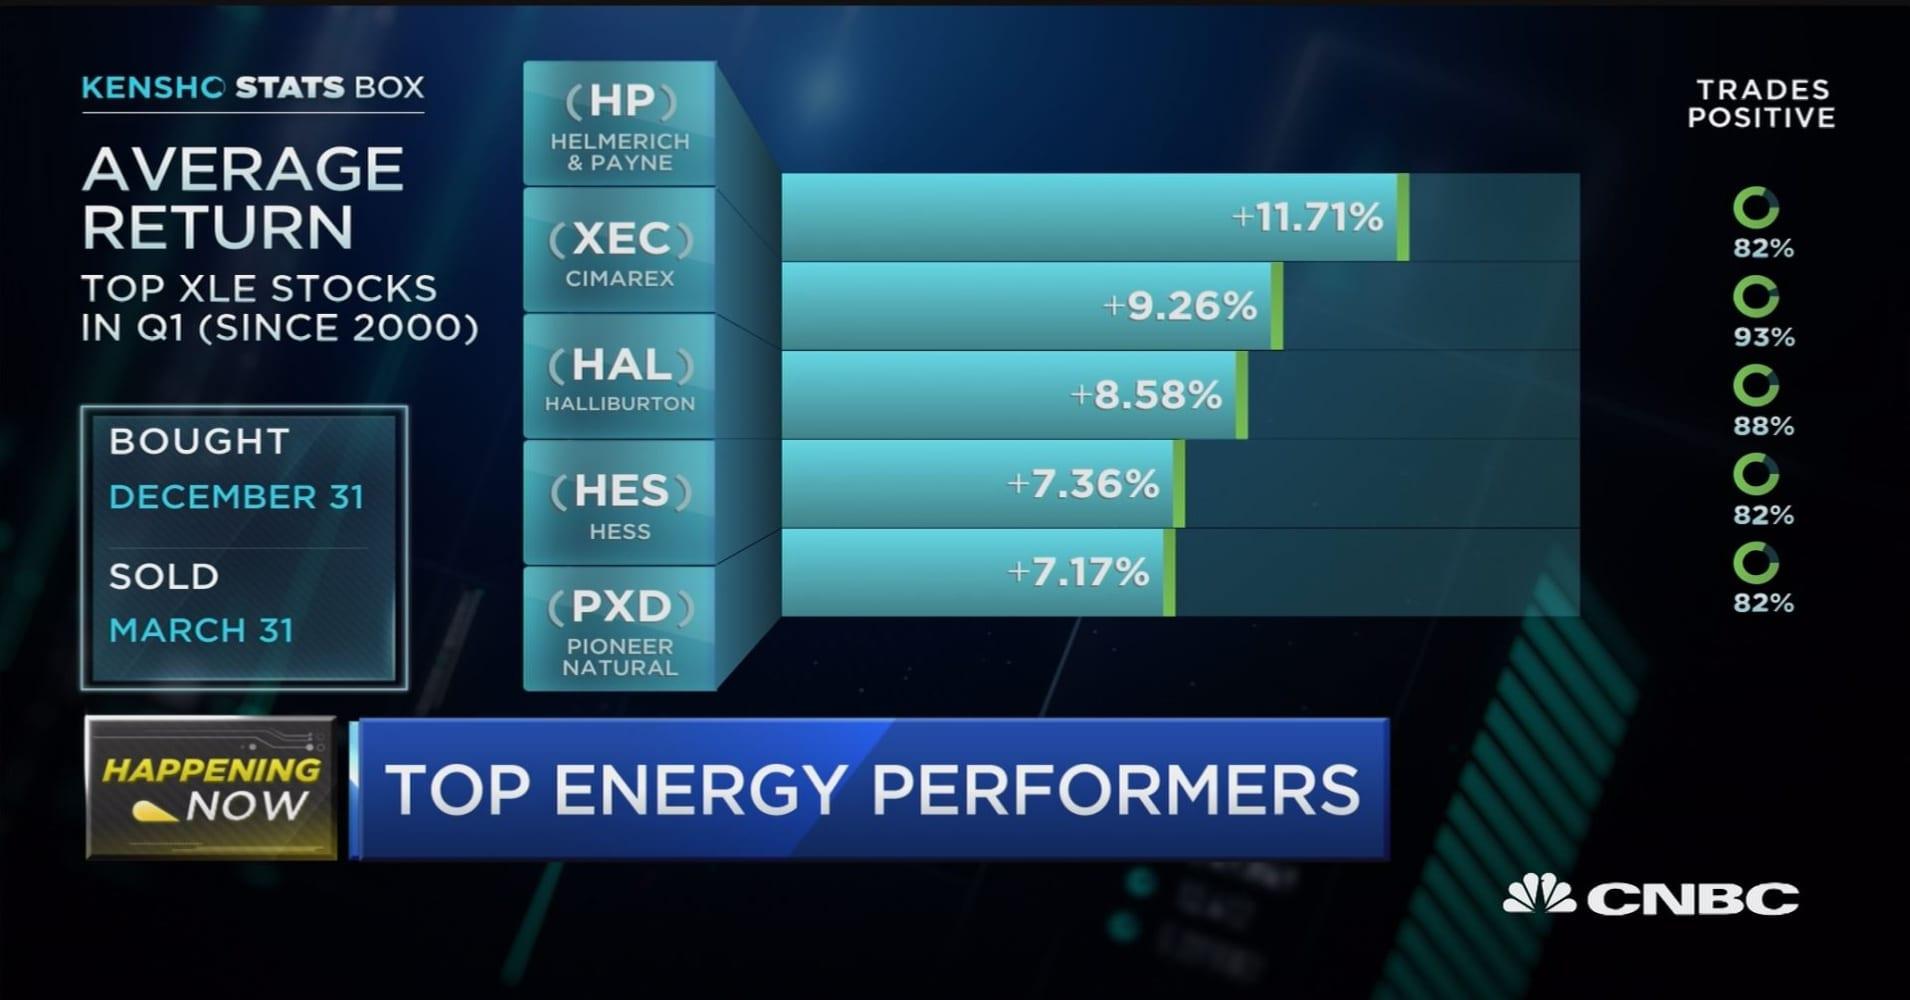 Top energy performers in Q1